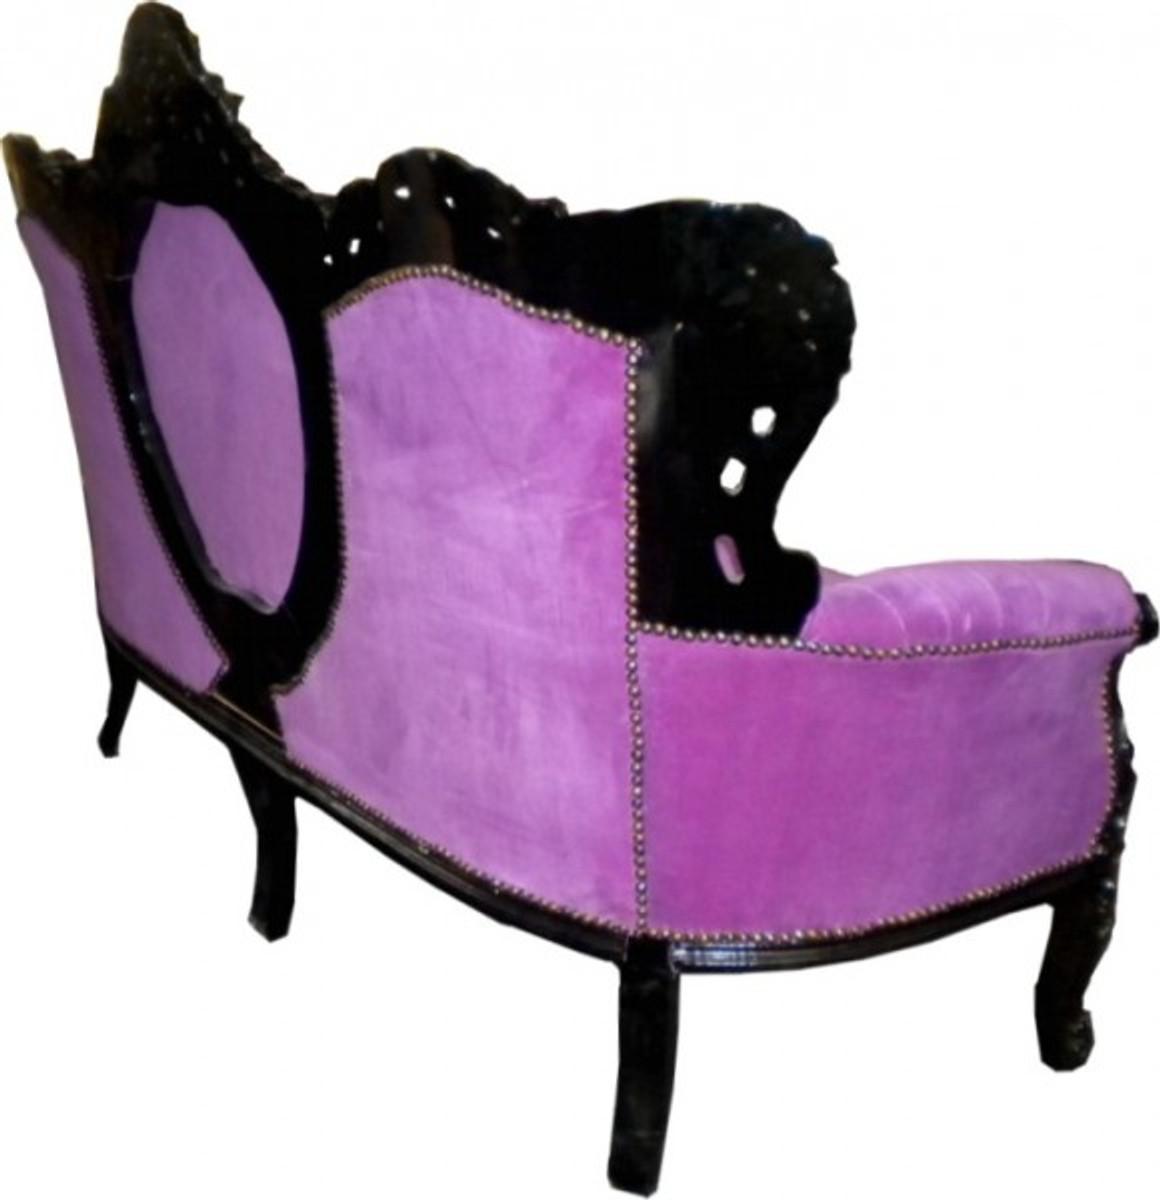 baroque sofa set king purple black sofas baroque sofas. Black Bedroom Furniture Sets. Home Design Ideas